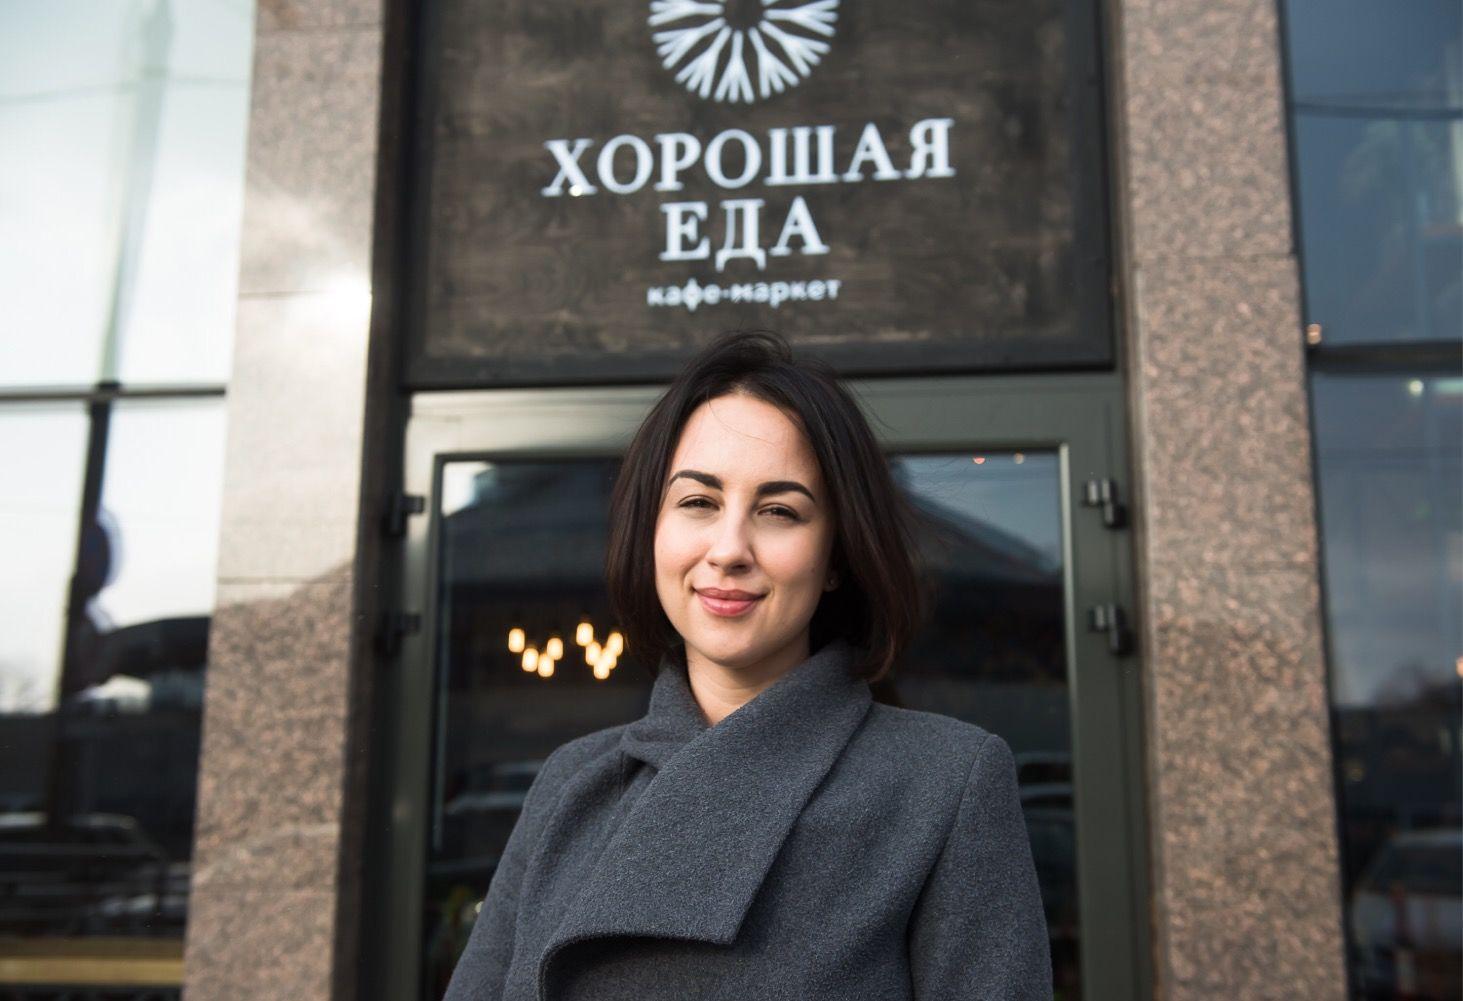 Кристина Ловлина © Фото Елены Синеок, Юга.ру